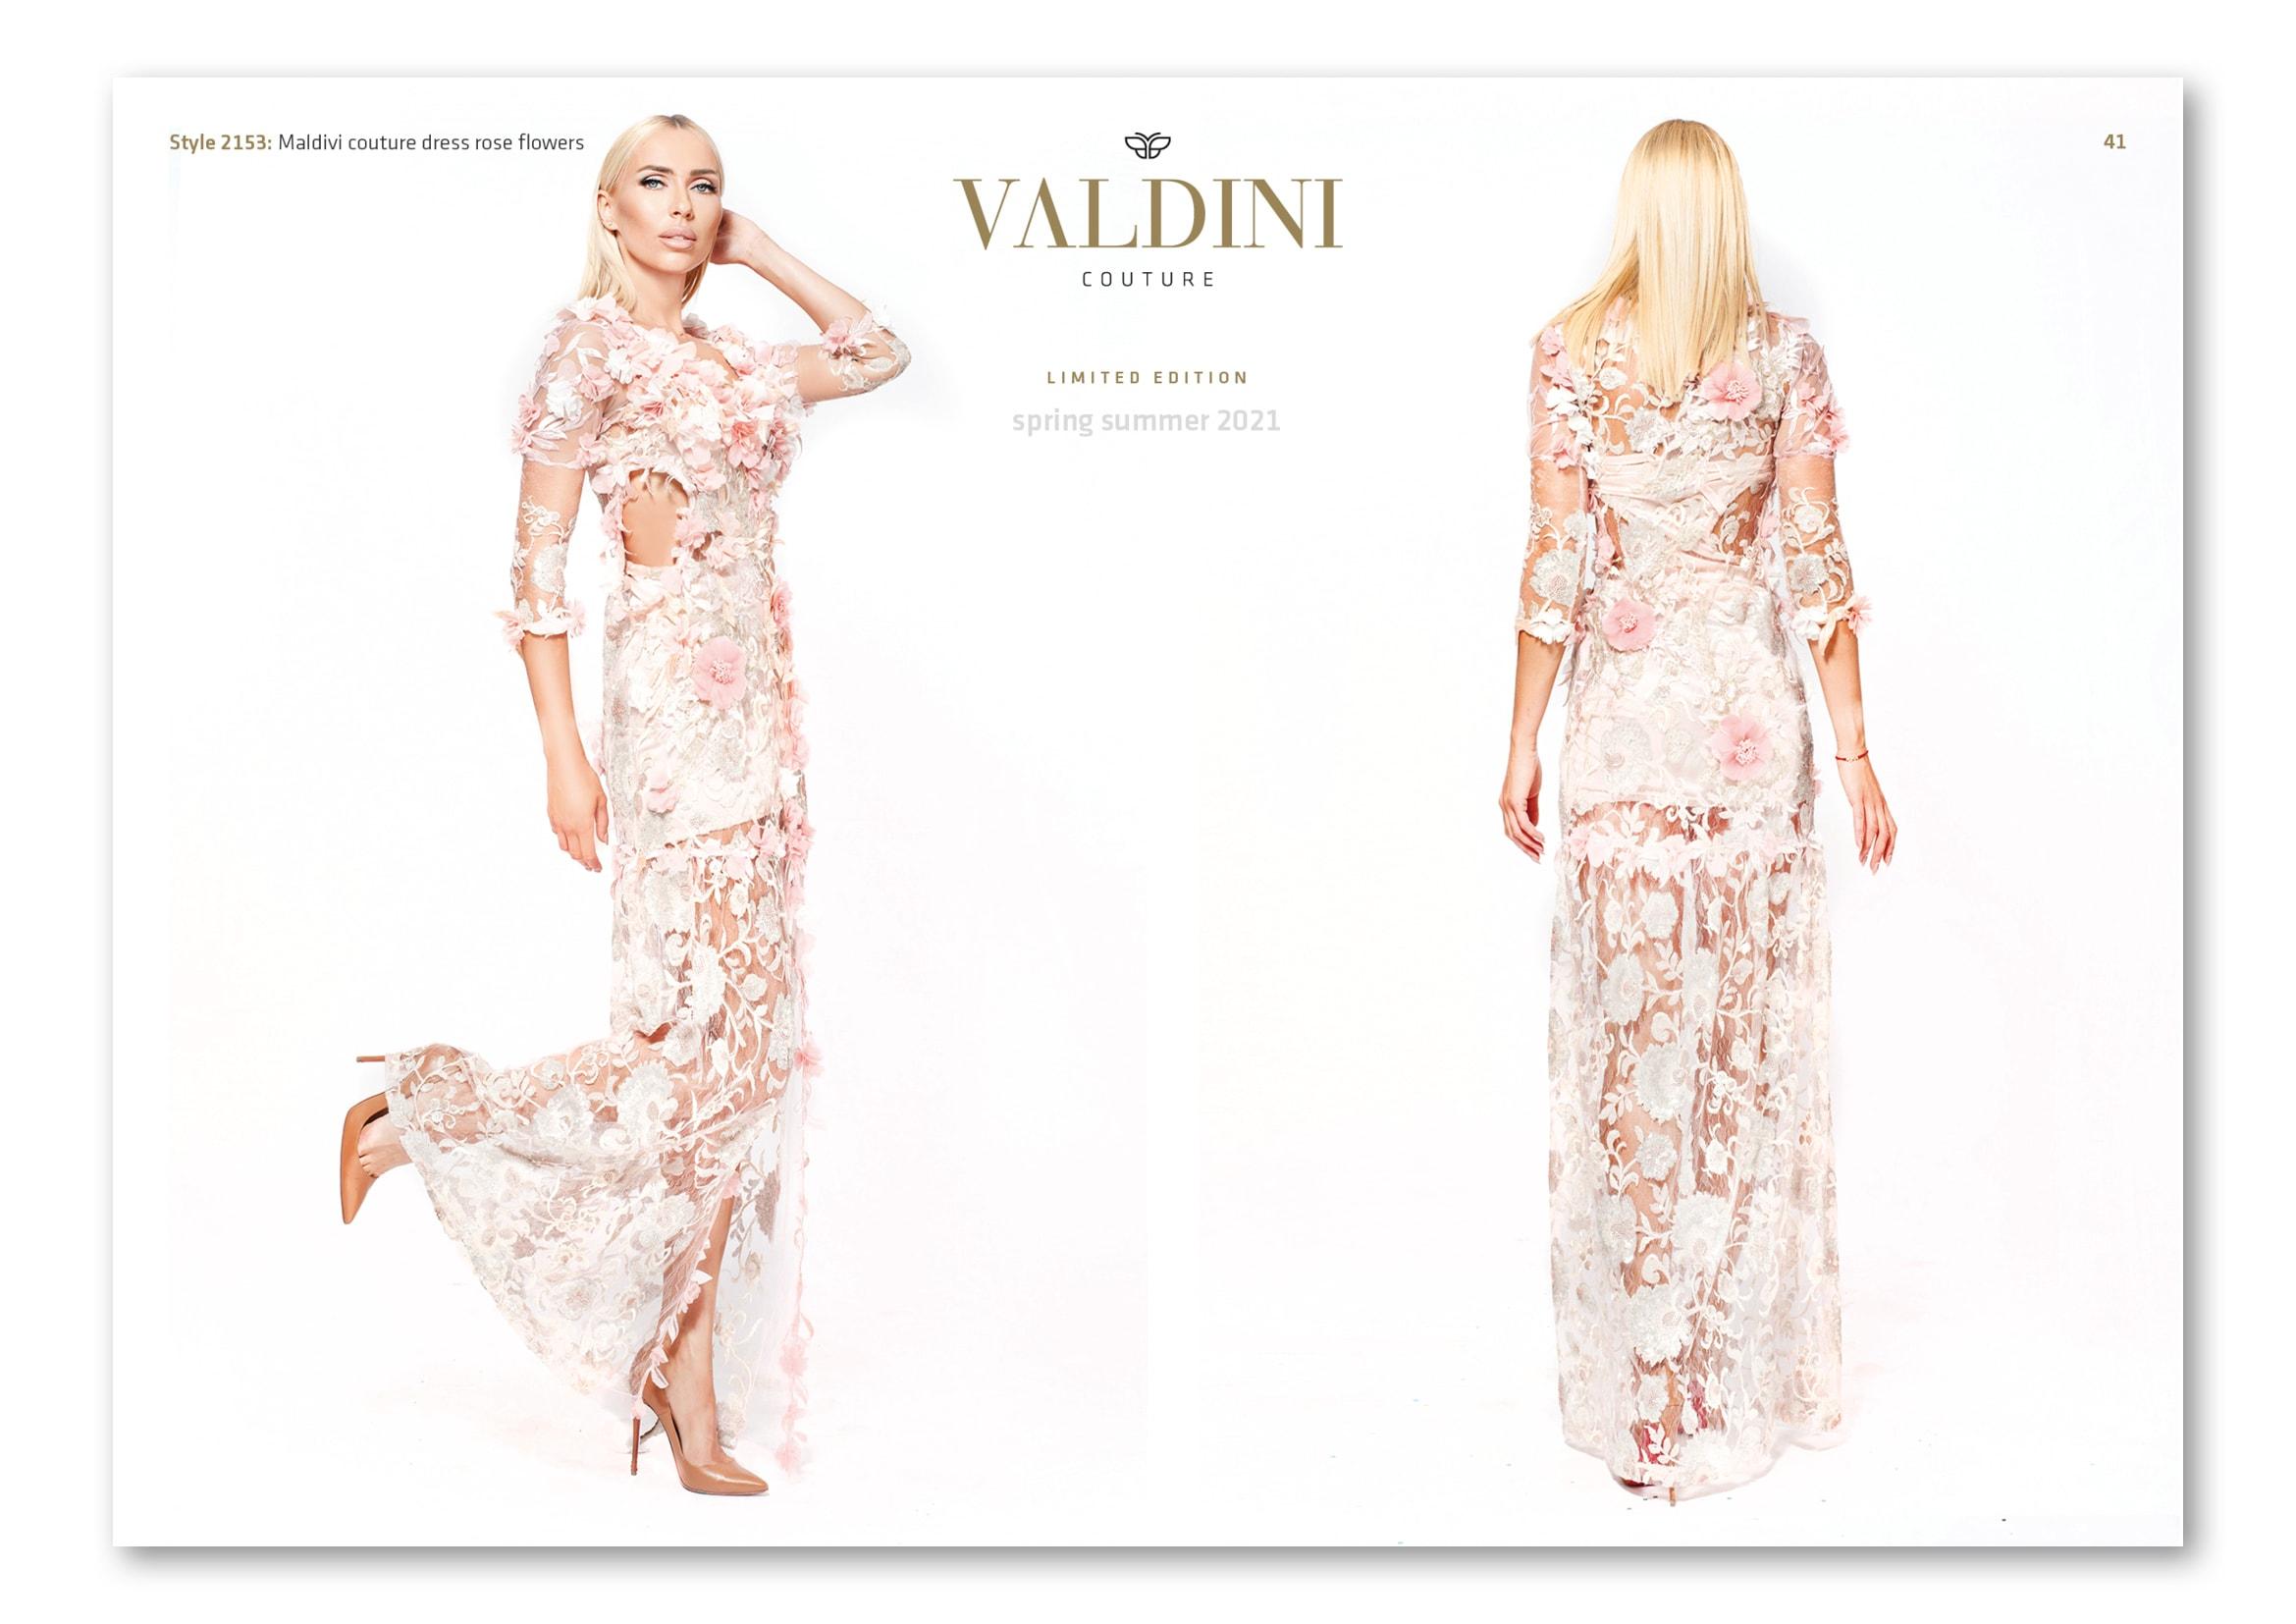 Gestaltung Mode-Lookbook für Modedesignerin Svetoslava Kirilova der Modemarke Valdini Couture